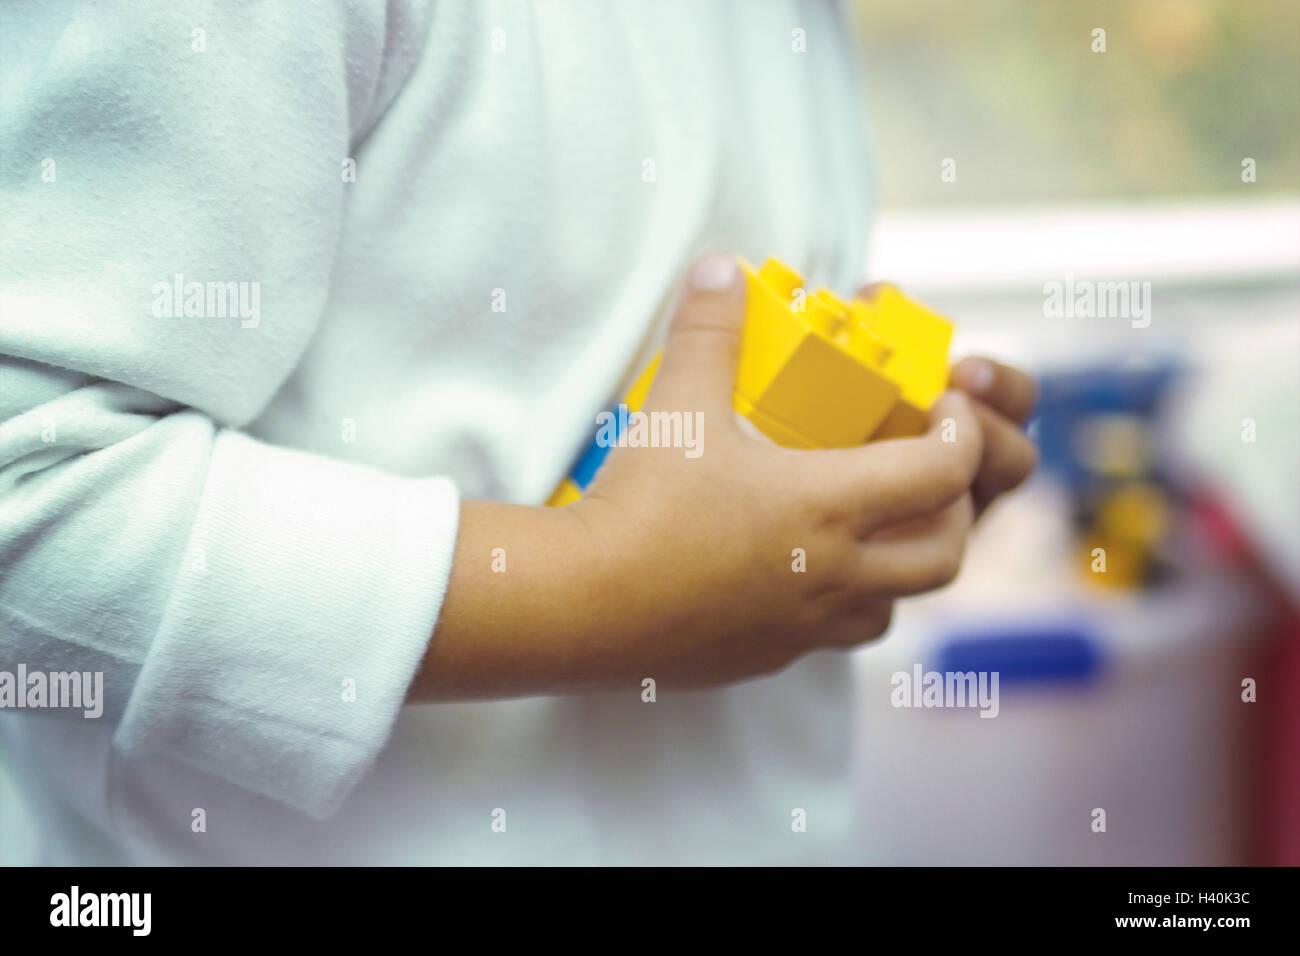 Manos Del Nino Componentes Mantenga Boy Detalle Manos 2 4 Anos